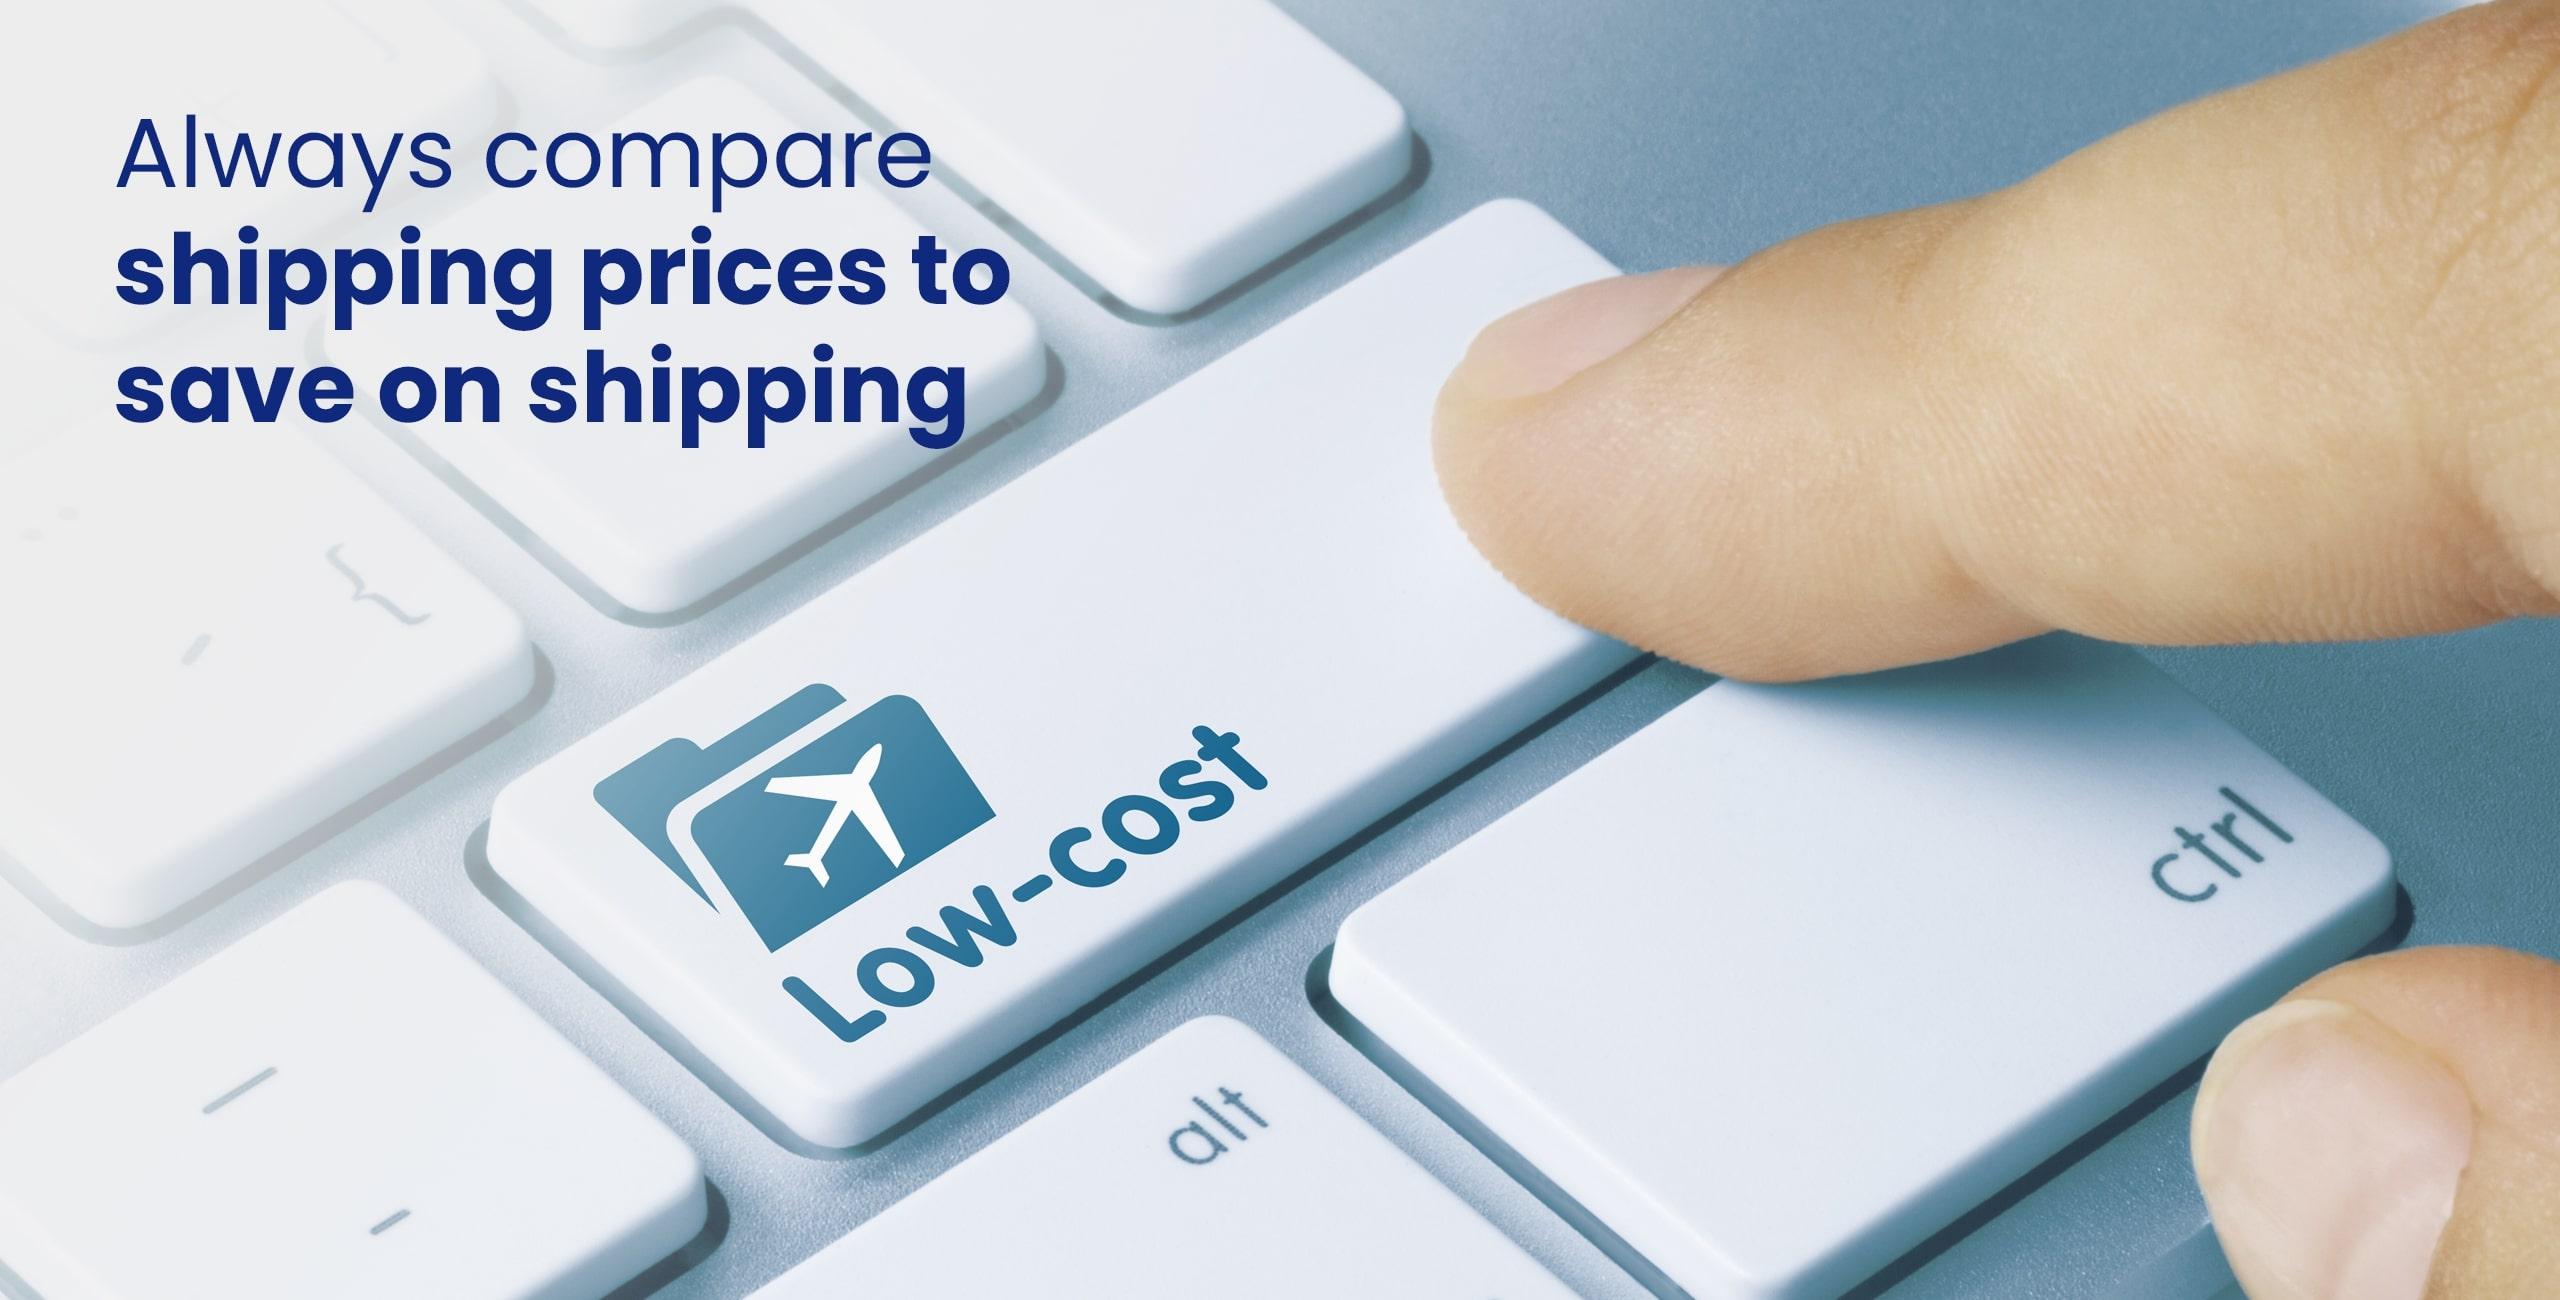 low cost shipments on keyboard